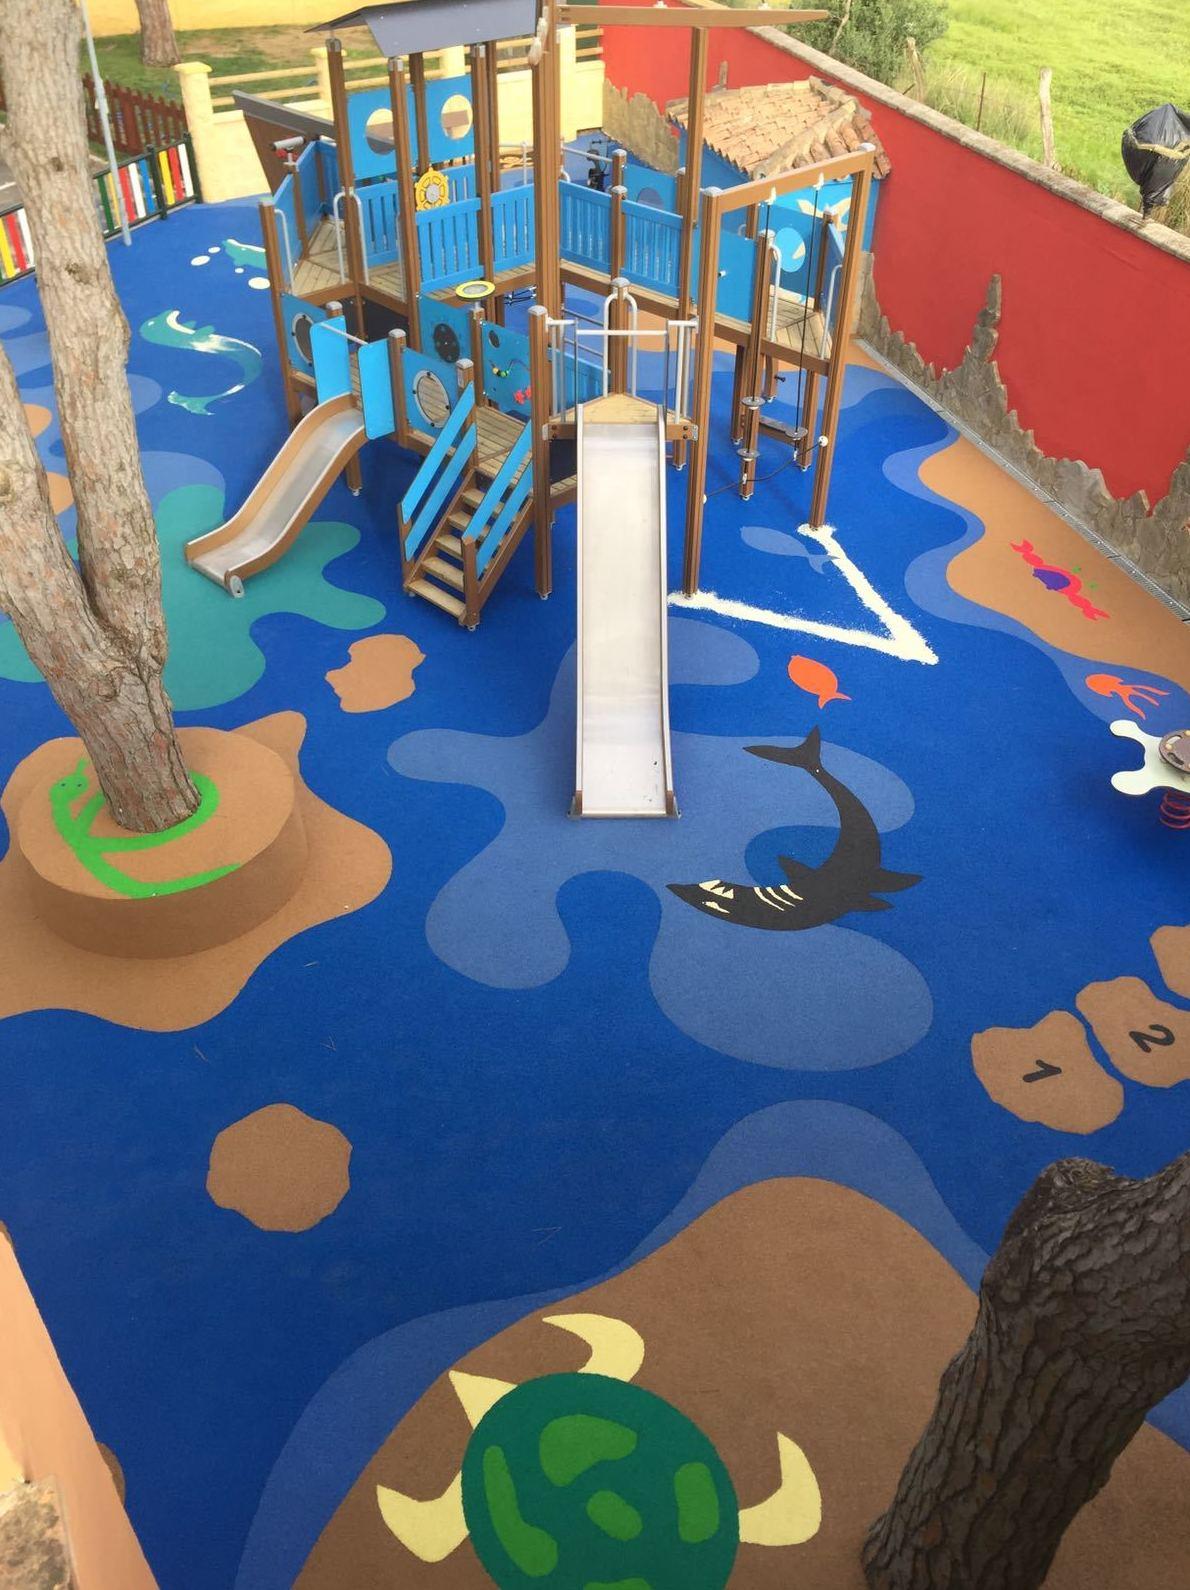 Foto 70 de Instalación de pavimentos de caucho para parques infantiles en Las Cabezas de San Juan | Pavimentos Garvel